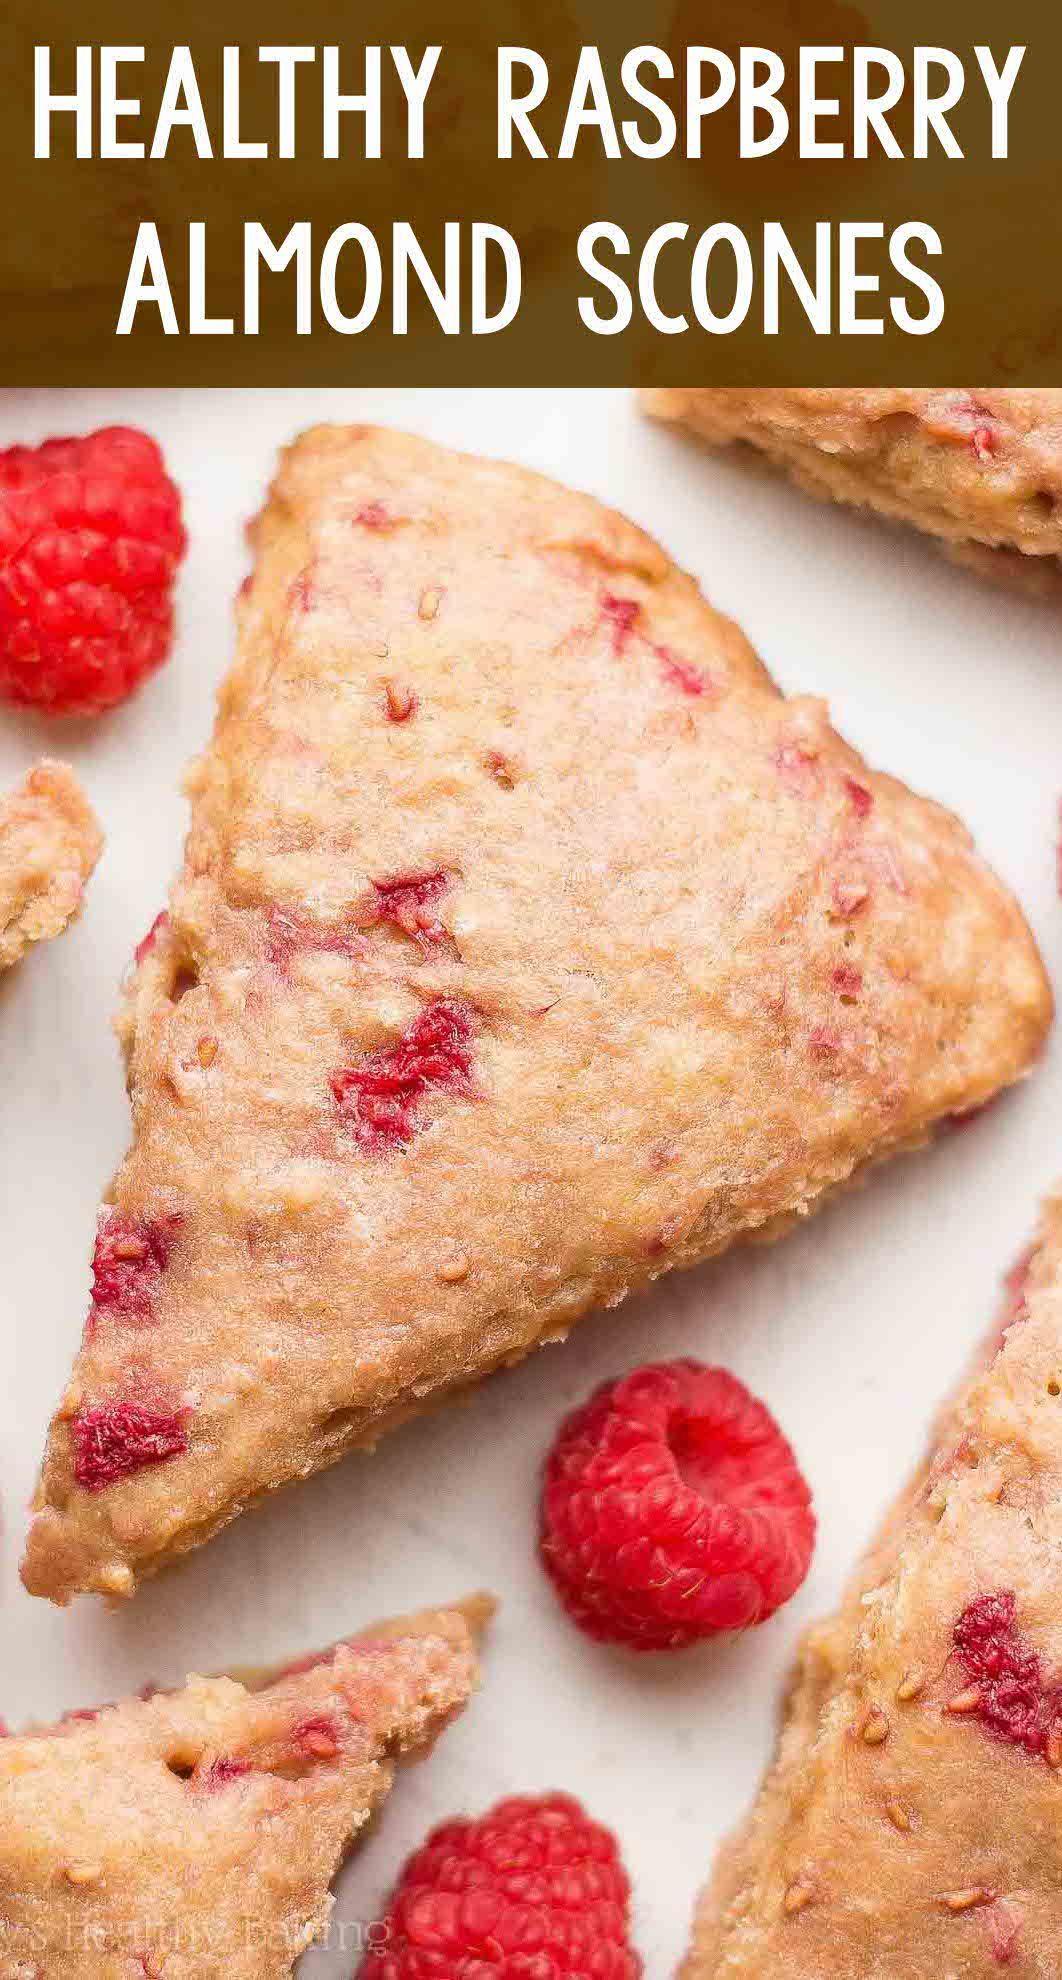 Healthy Raspberry Almond Scones - an easy, one-bowl recipe ...